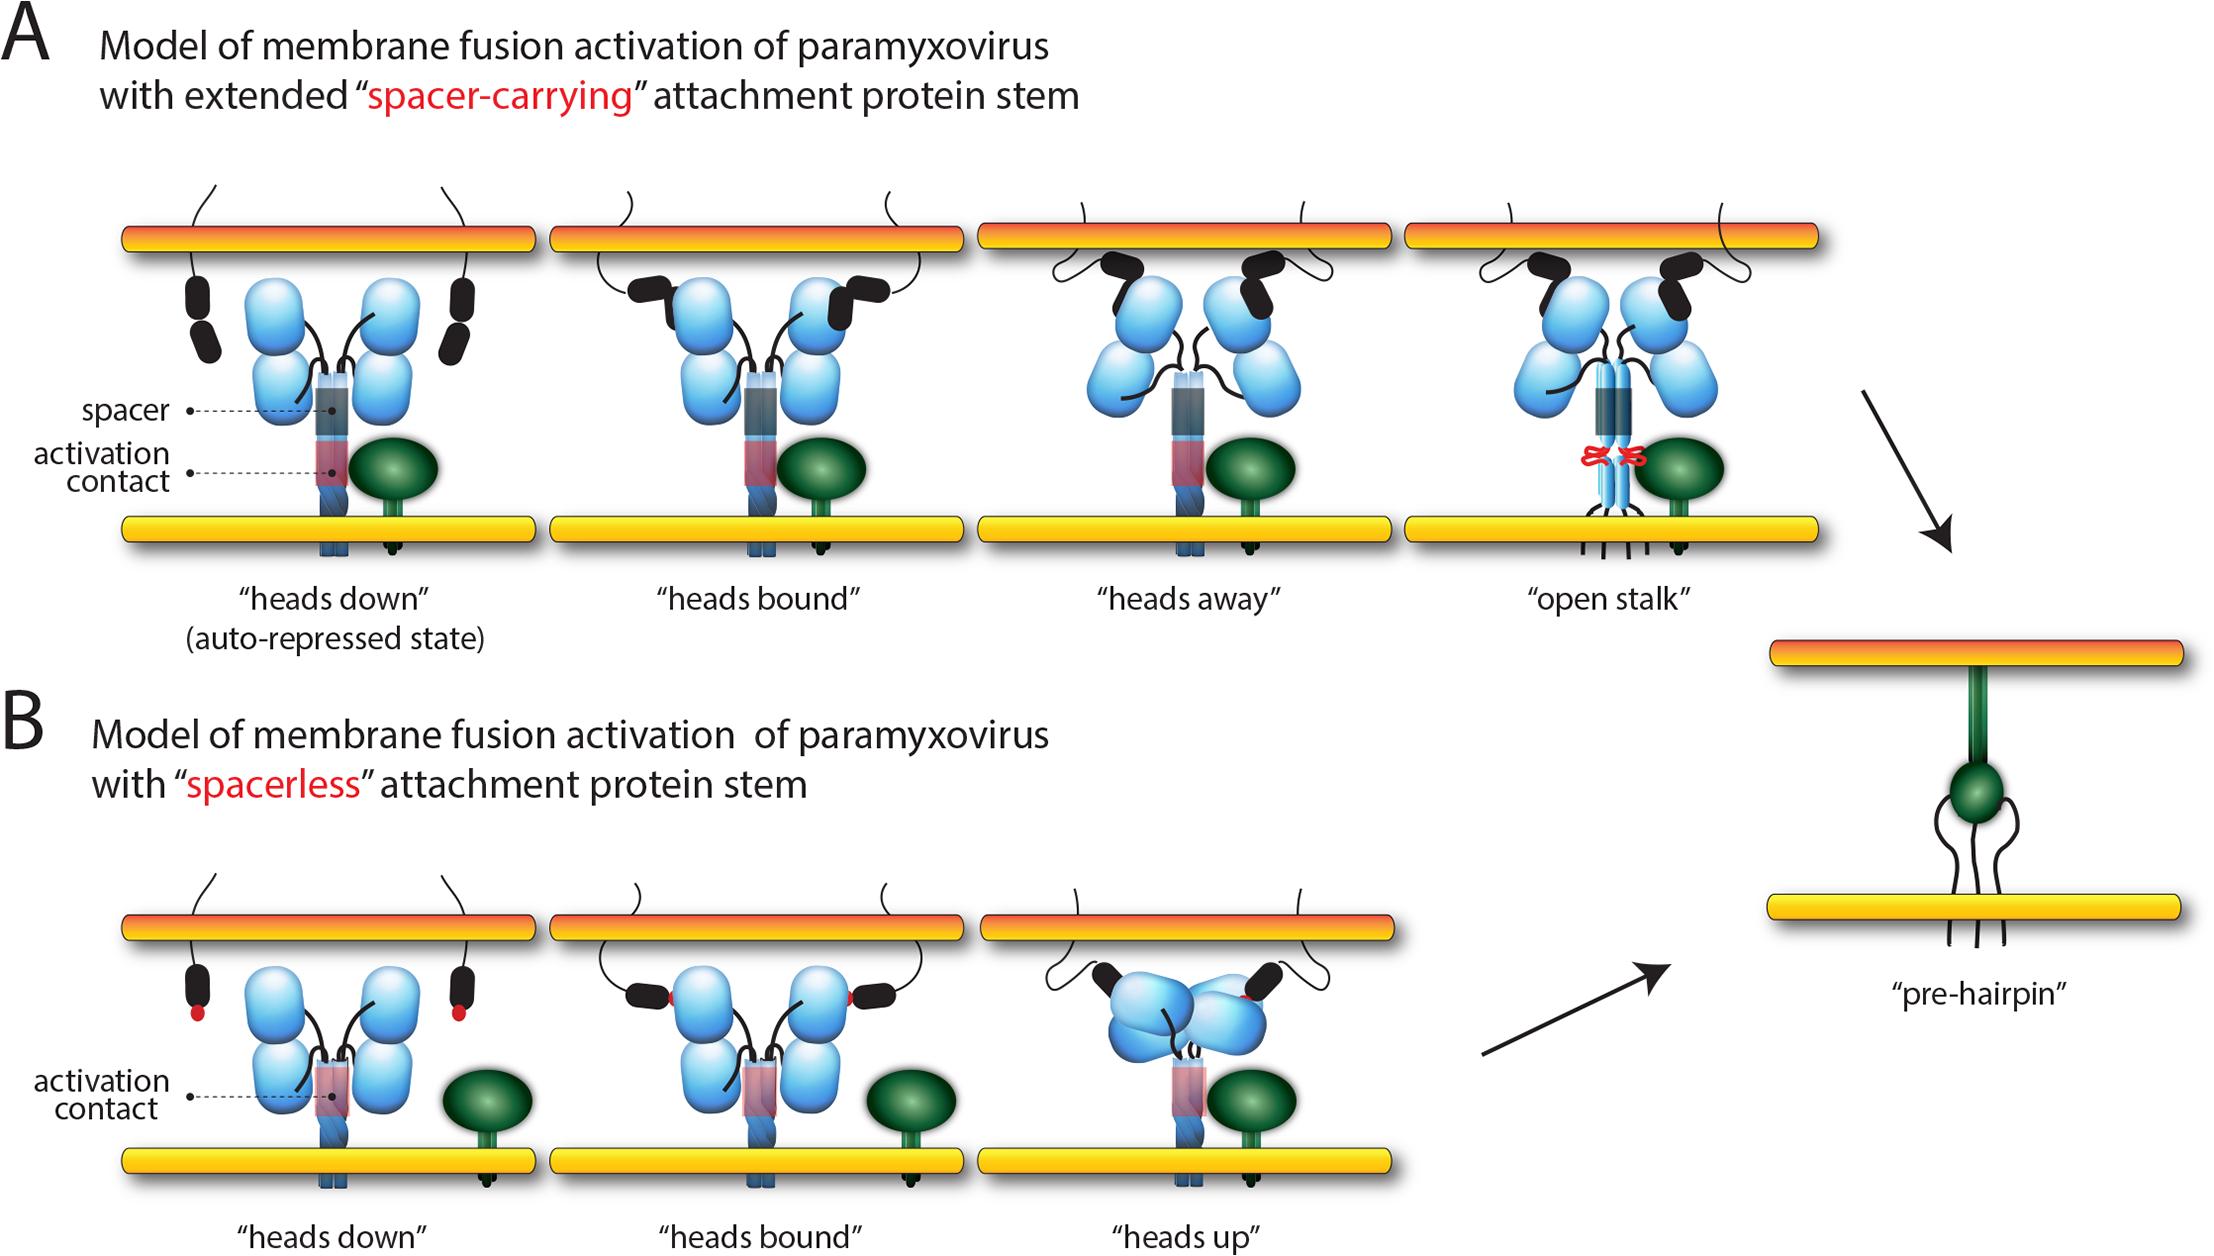 Models of paramyxovirus membrane fusion activation.